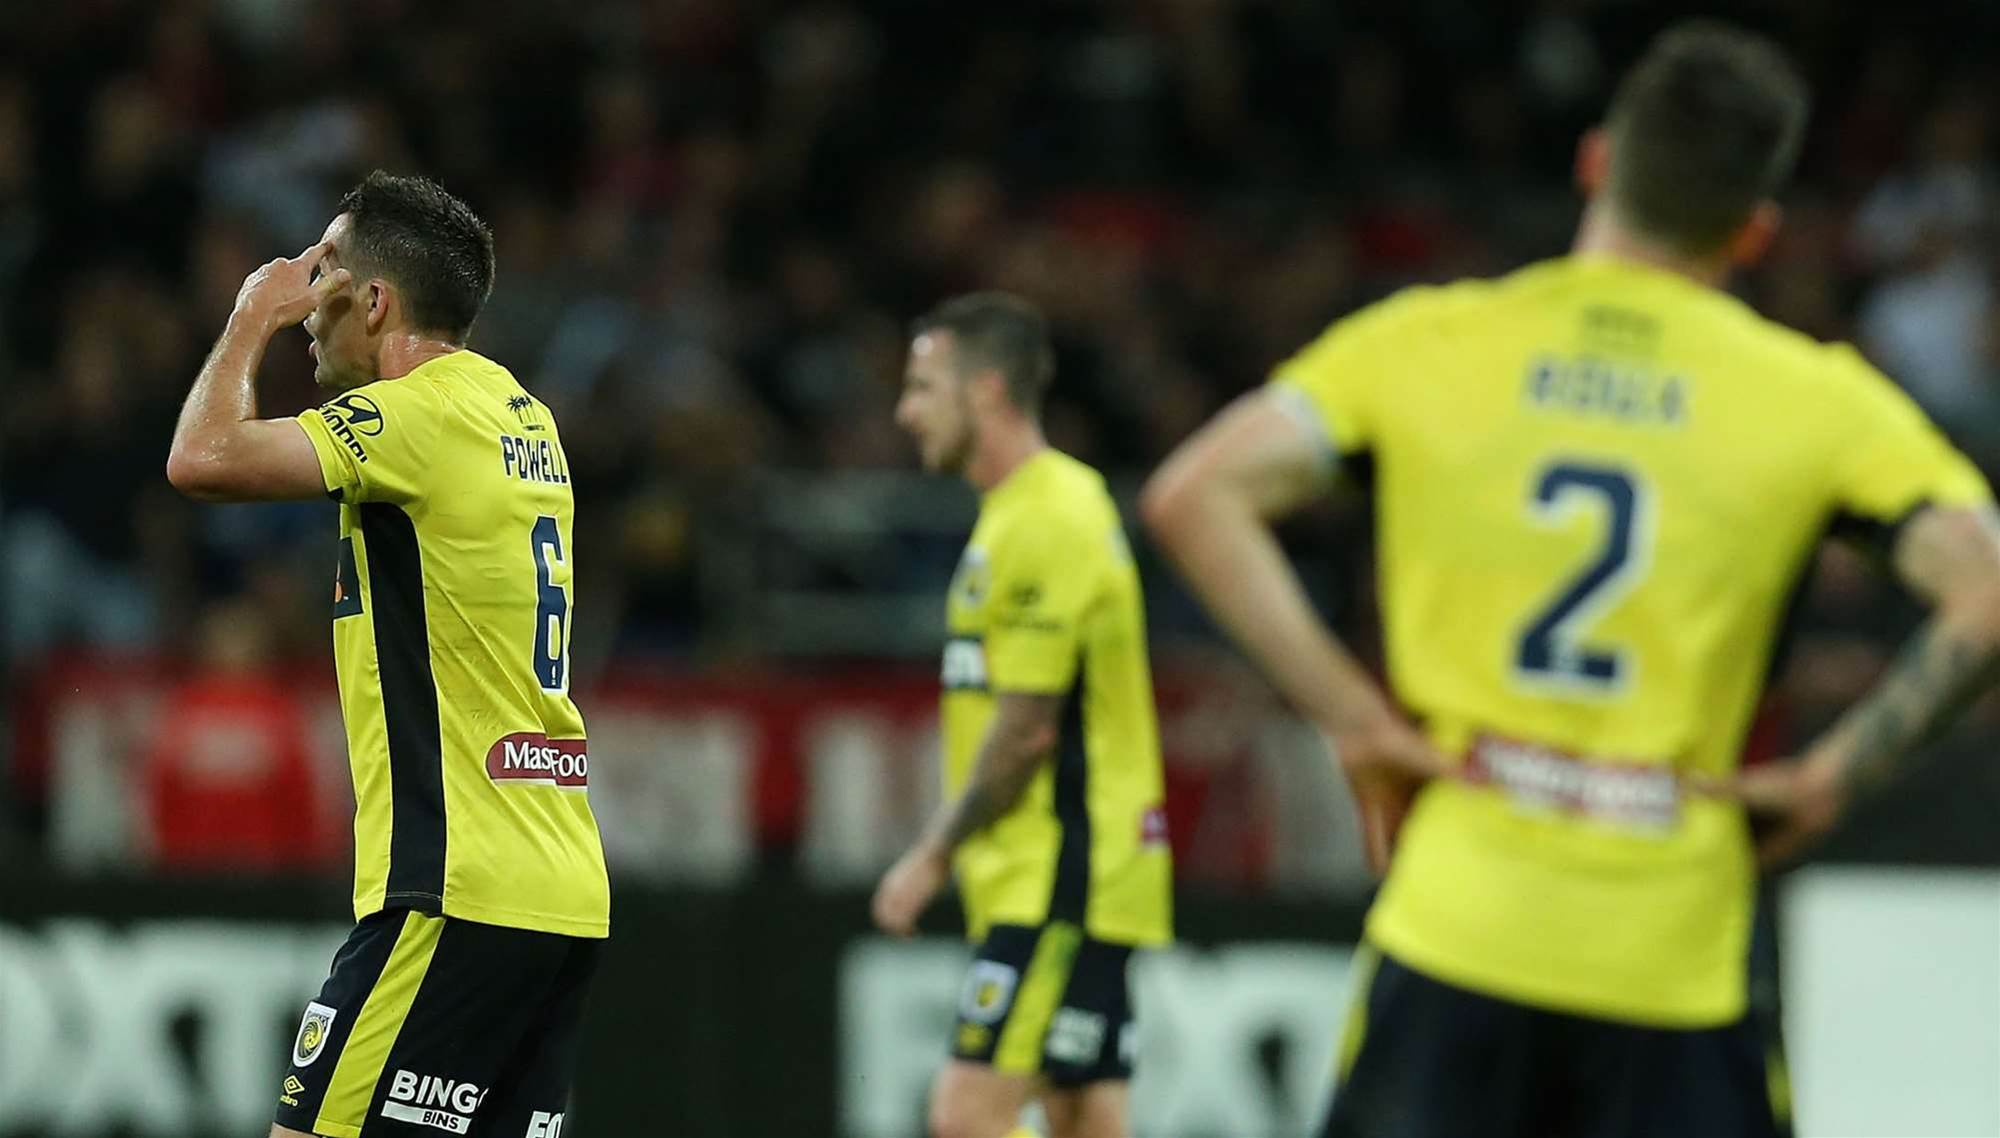 Bosnich renews calls for fifth official